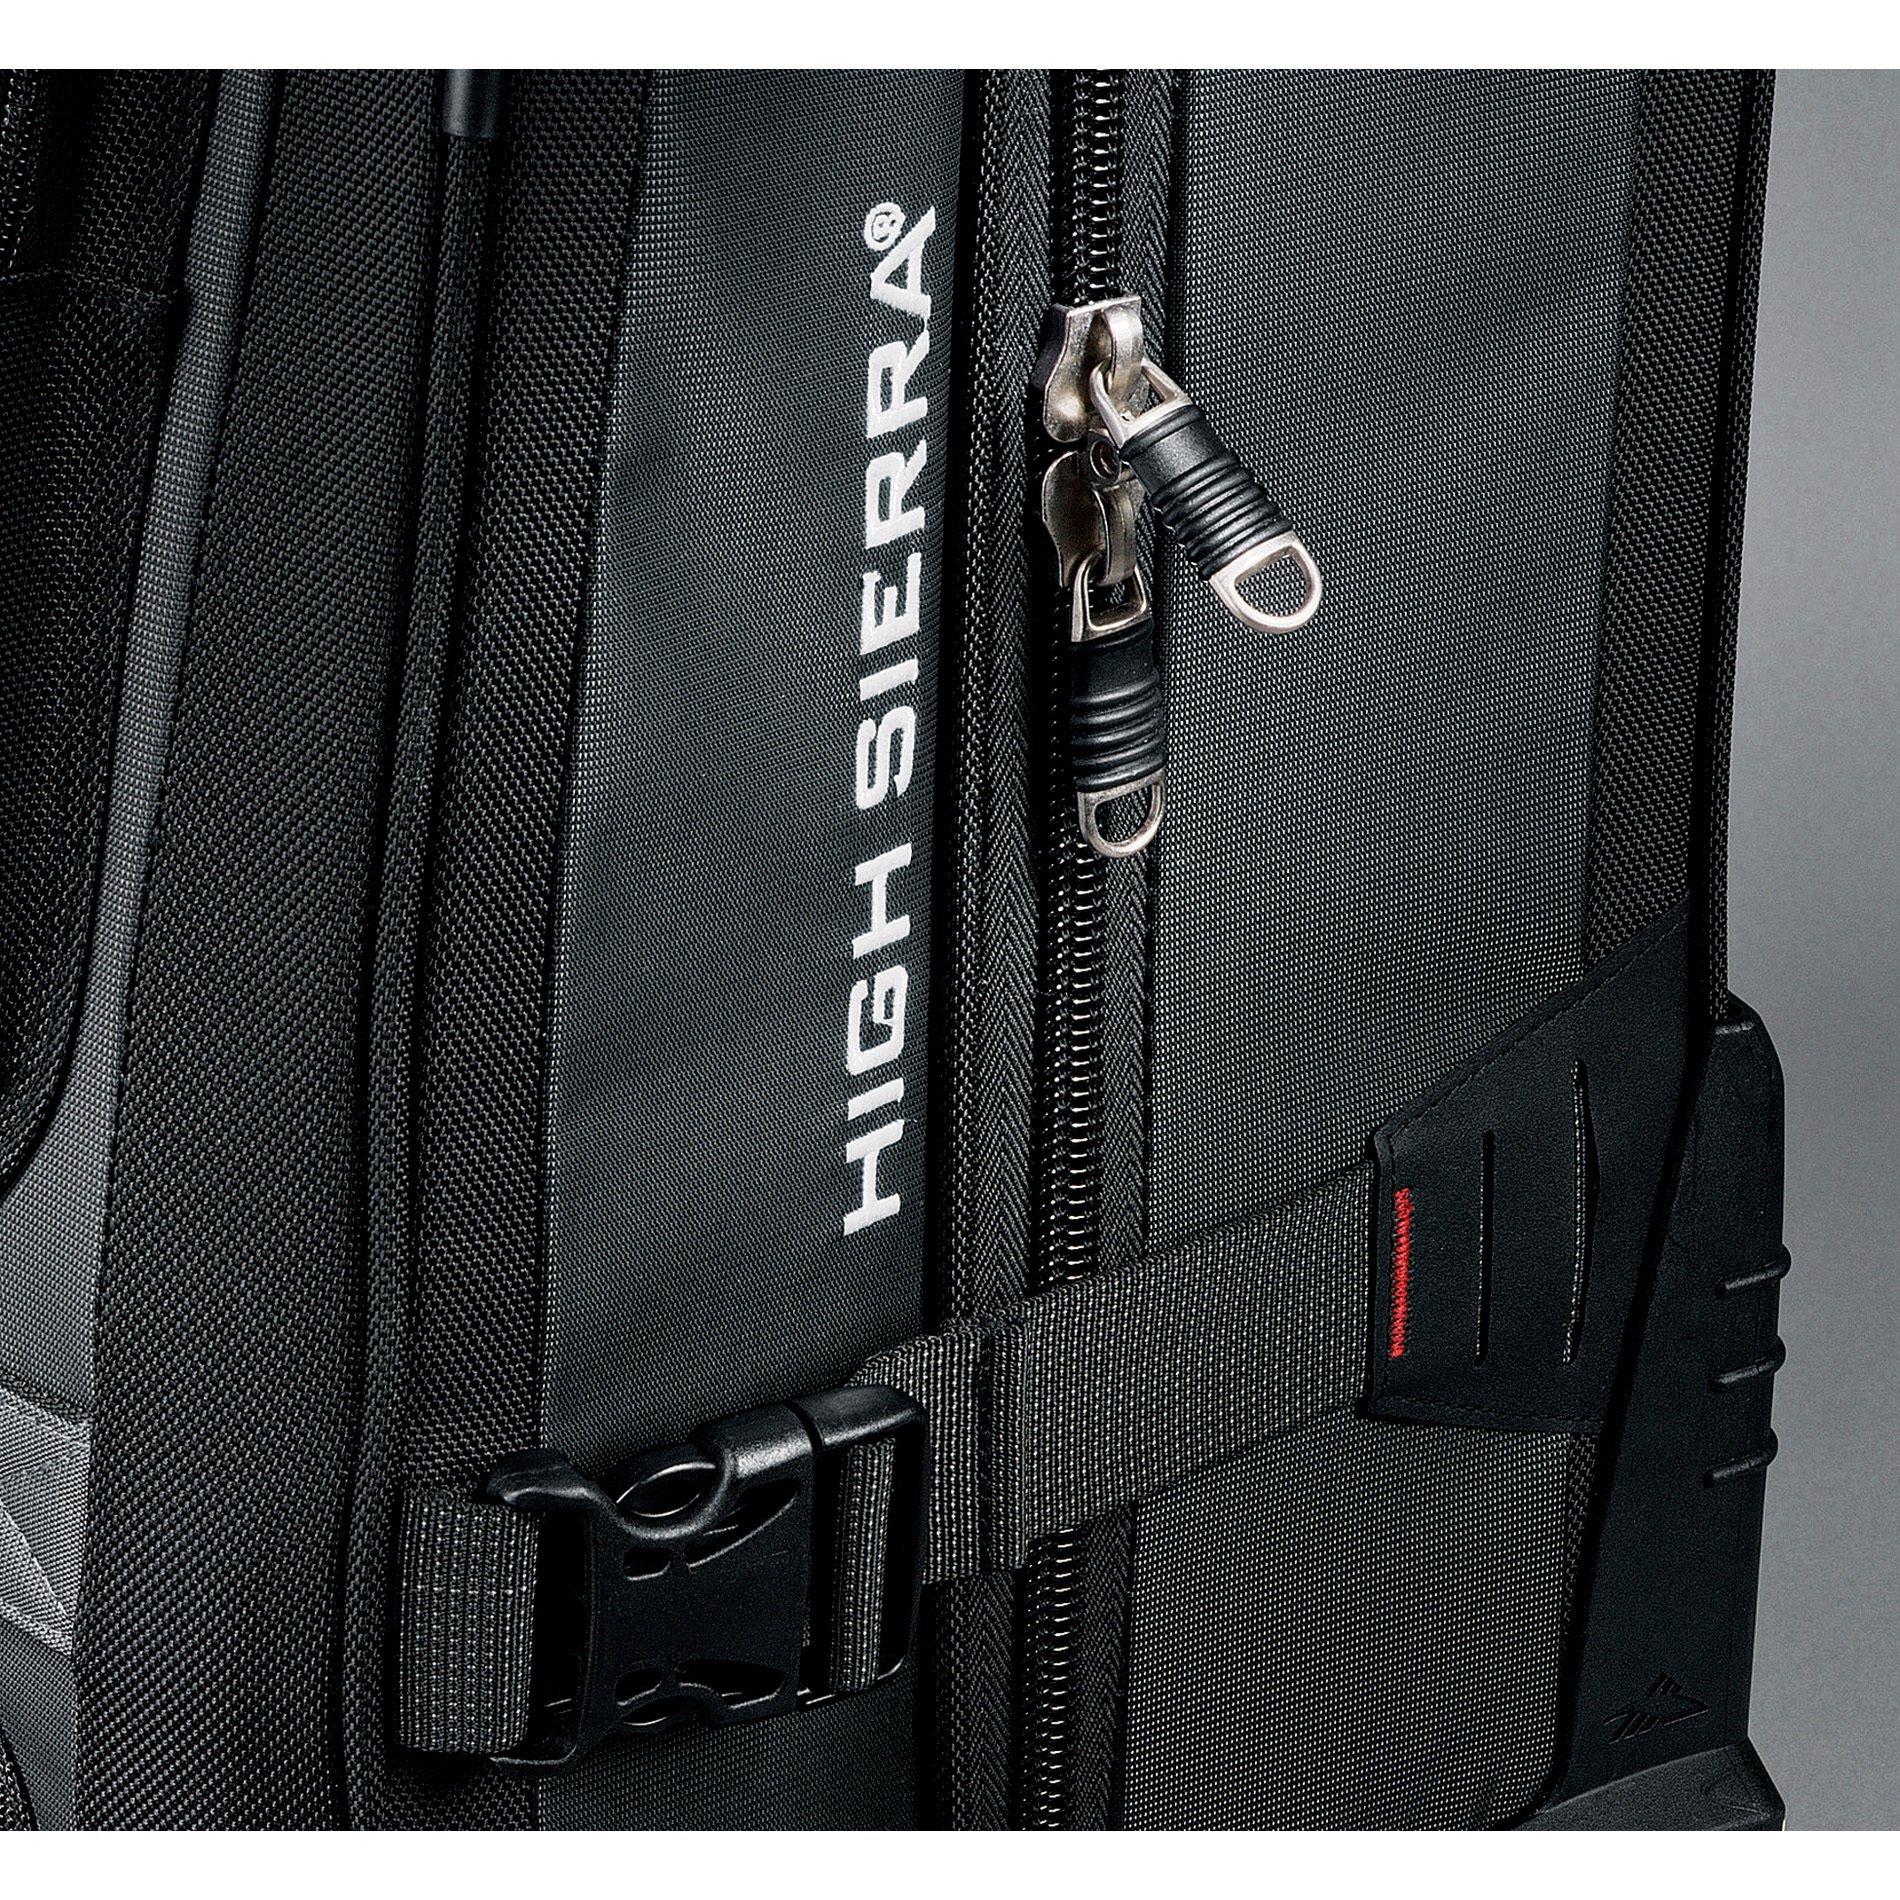 "High Sierra® 21"" Carry-On Upright Wheeled Duffel Bag"